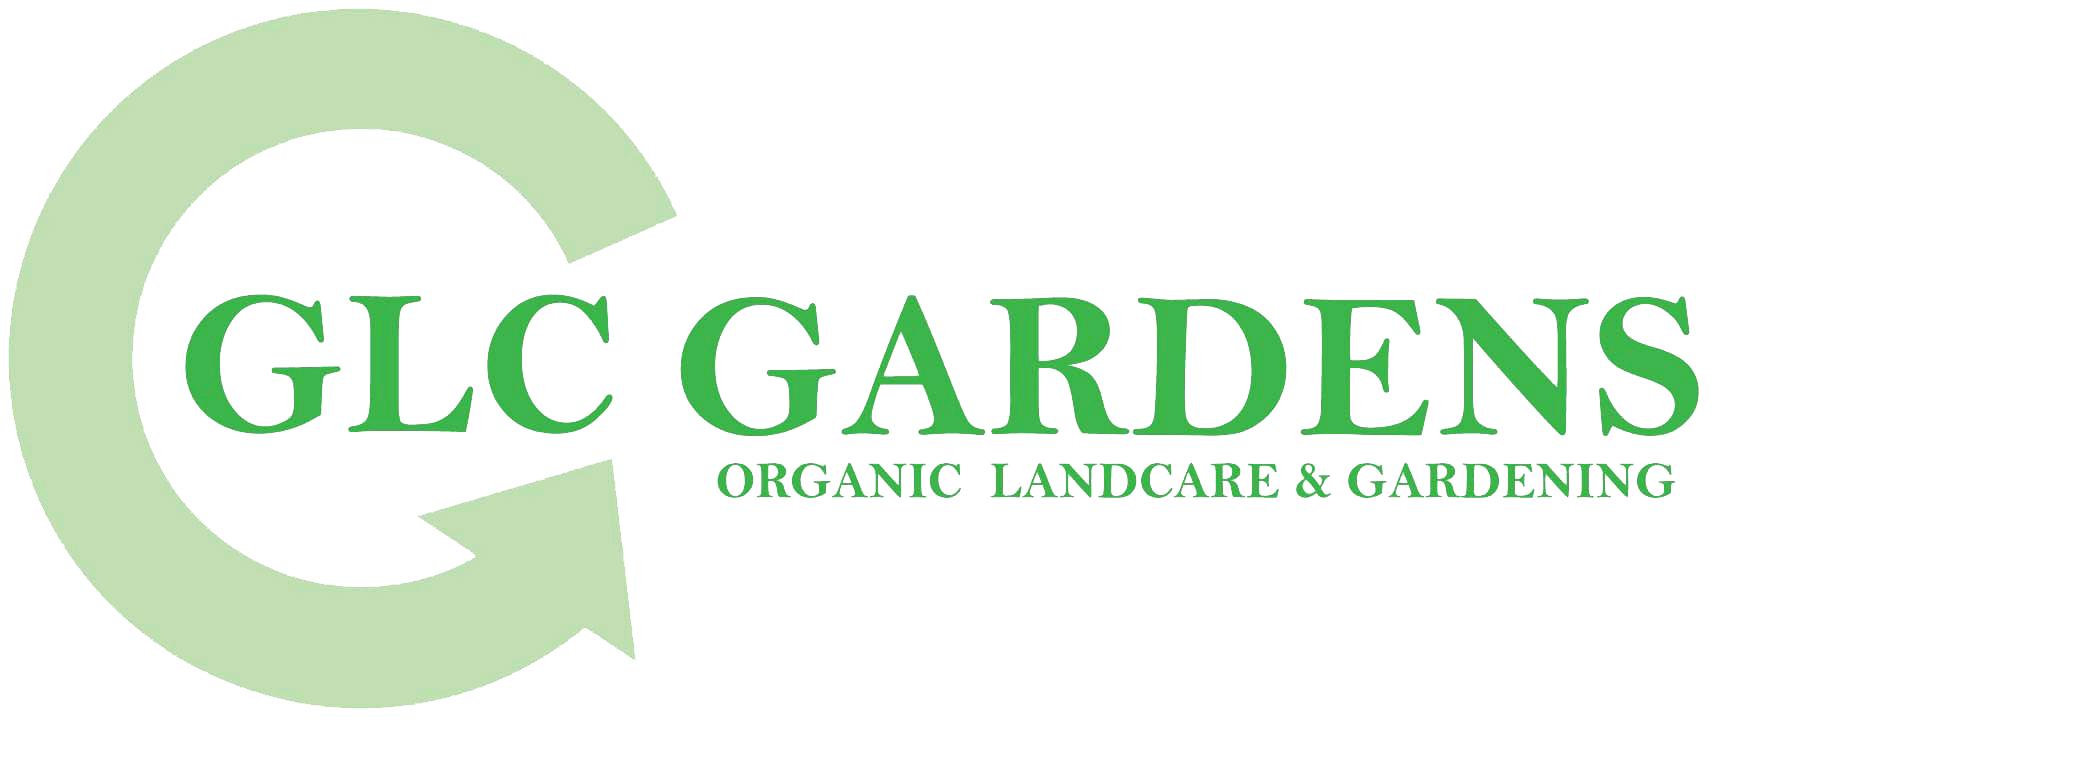 2014-GLC-Gardens-LOGO.png